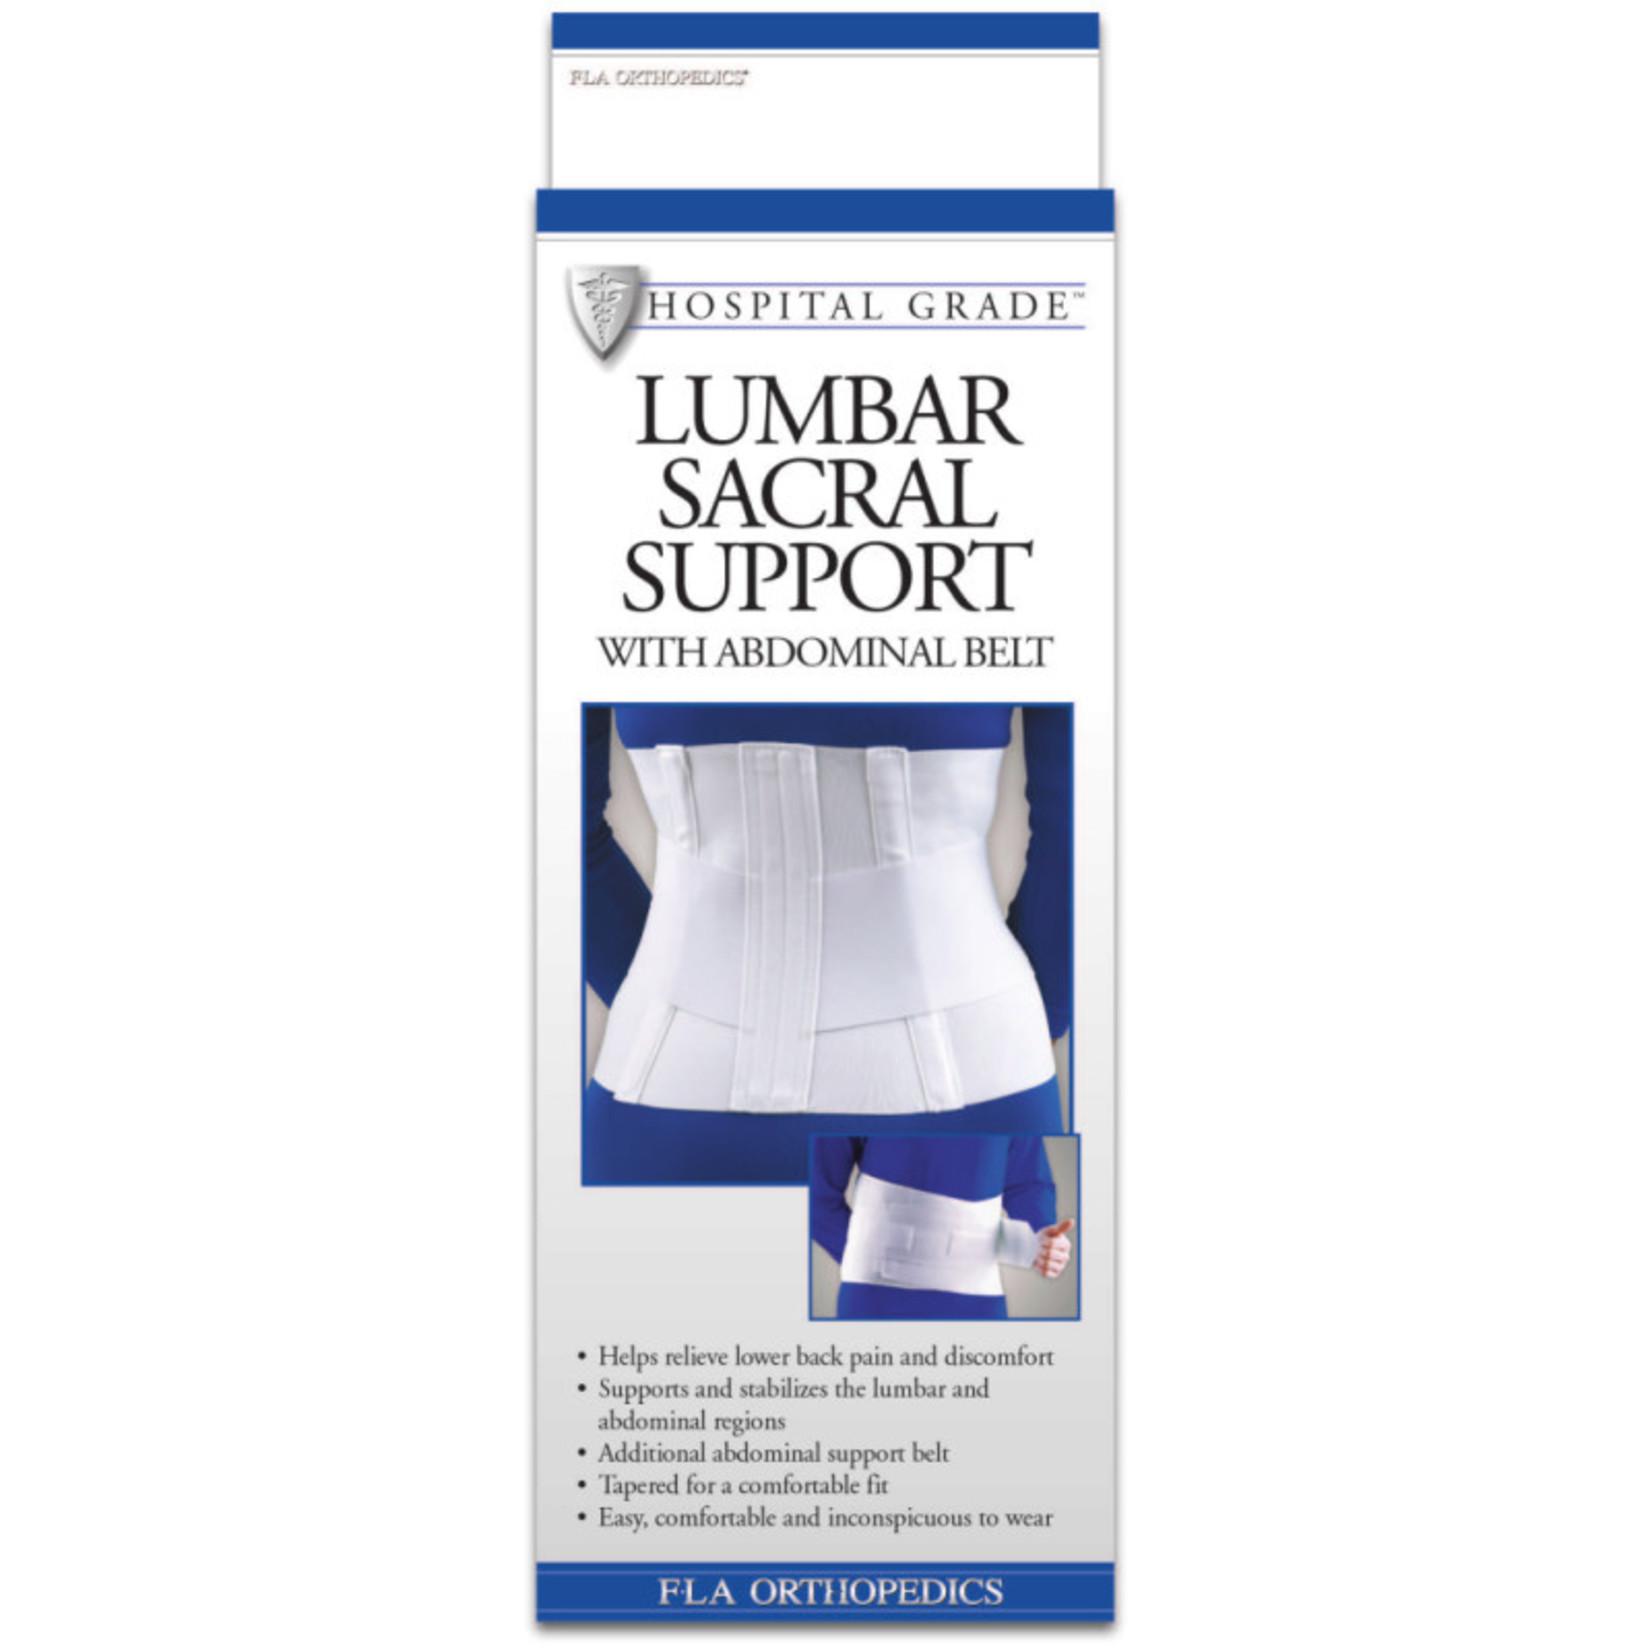 FLA Orthopedics LUMBAR SUPPORT SACRAL W/ABDOMINAL BELT 10IN WHITE